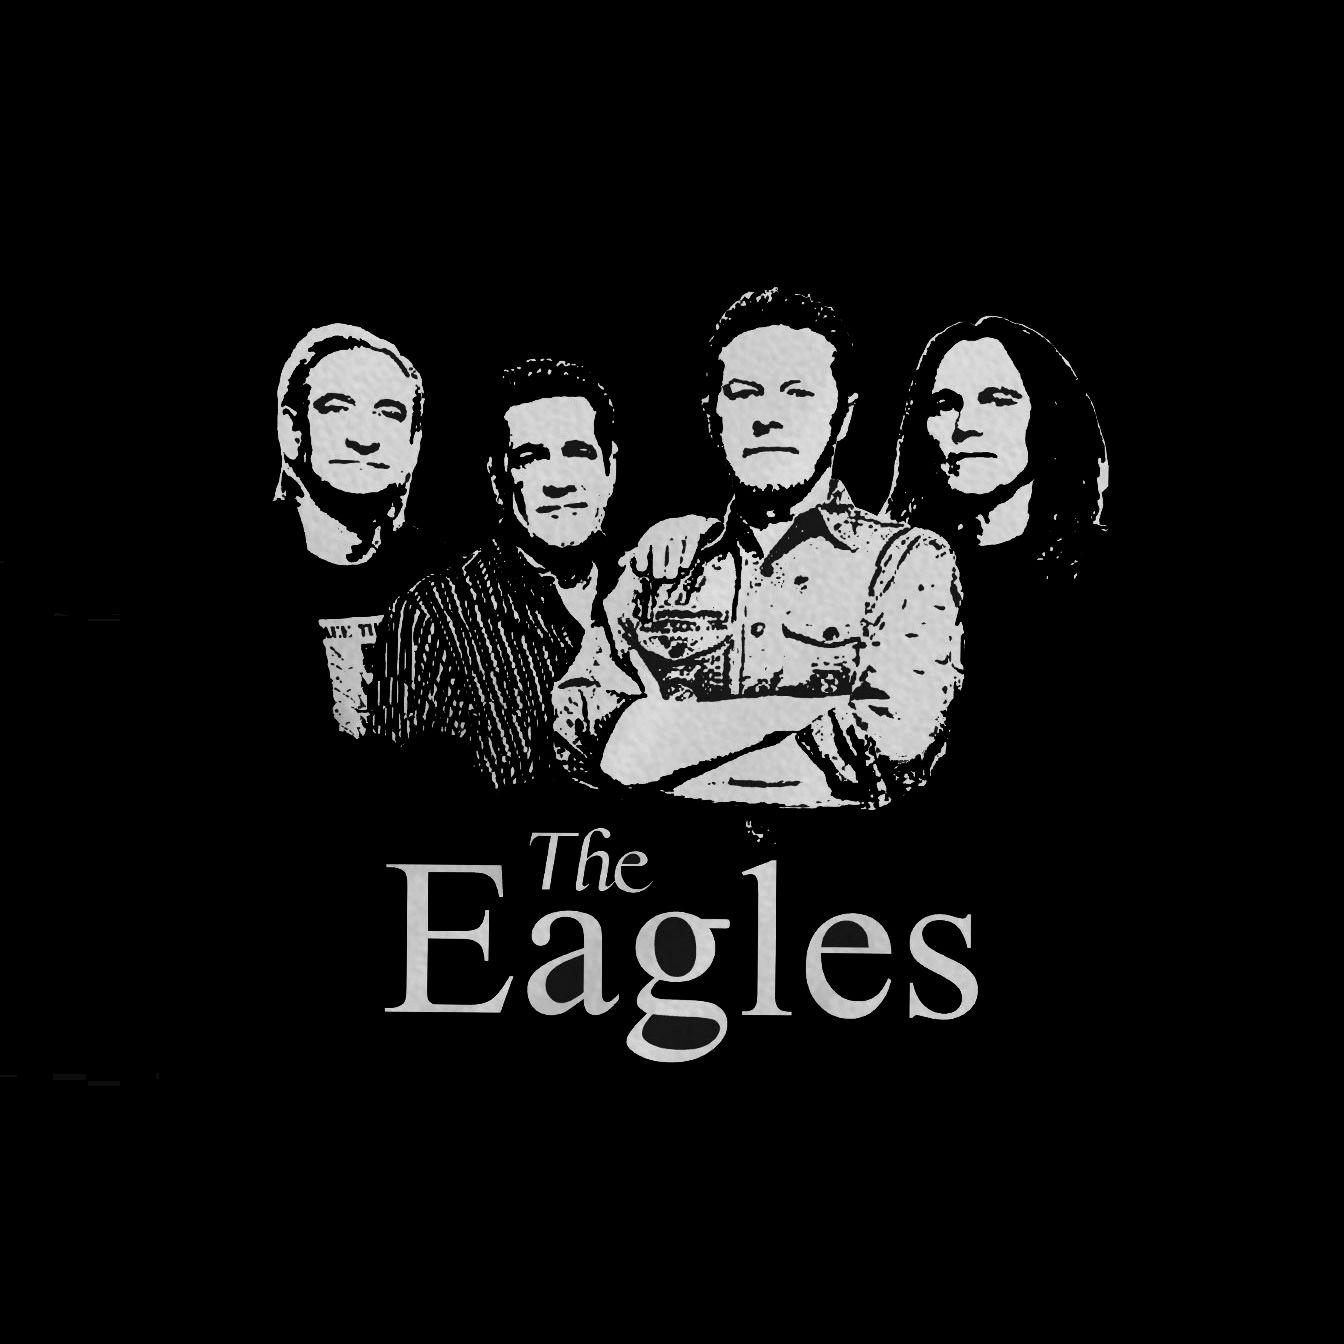 The eagles band logos